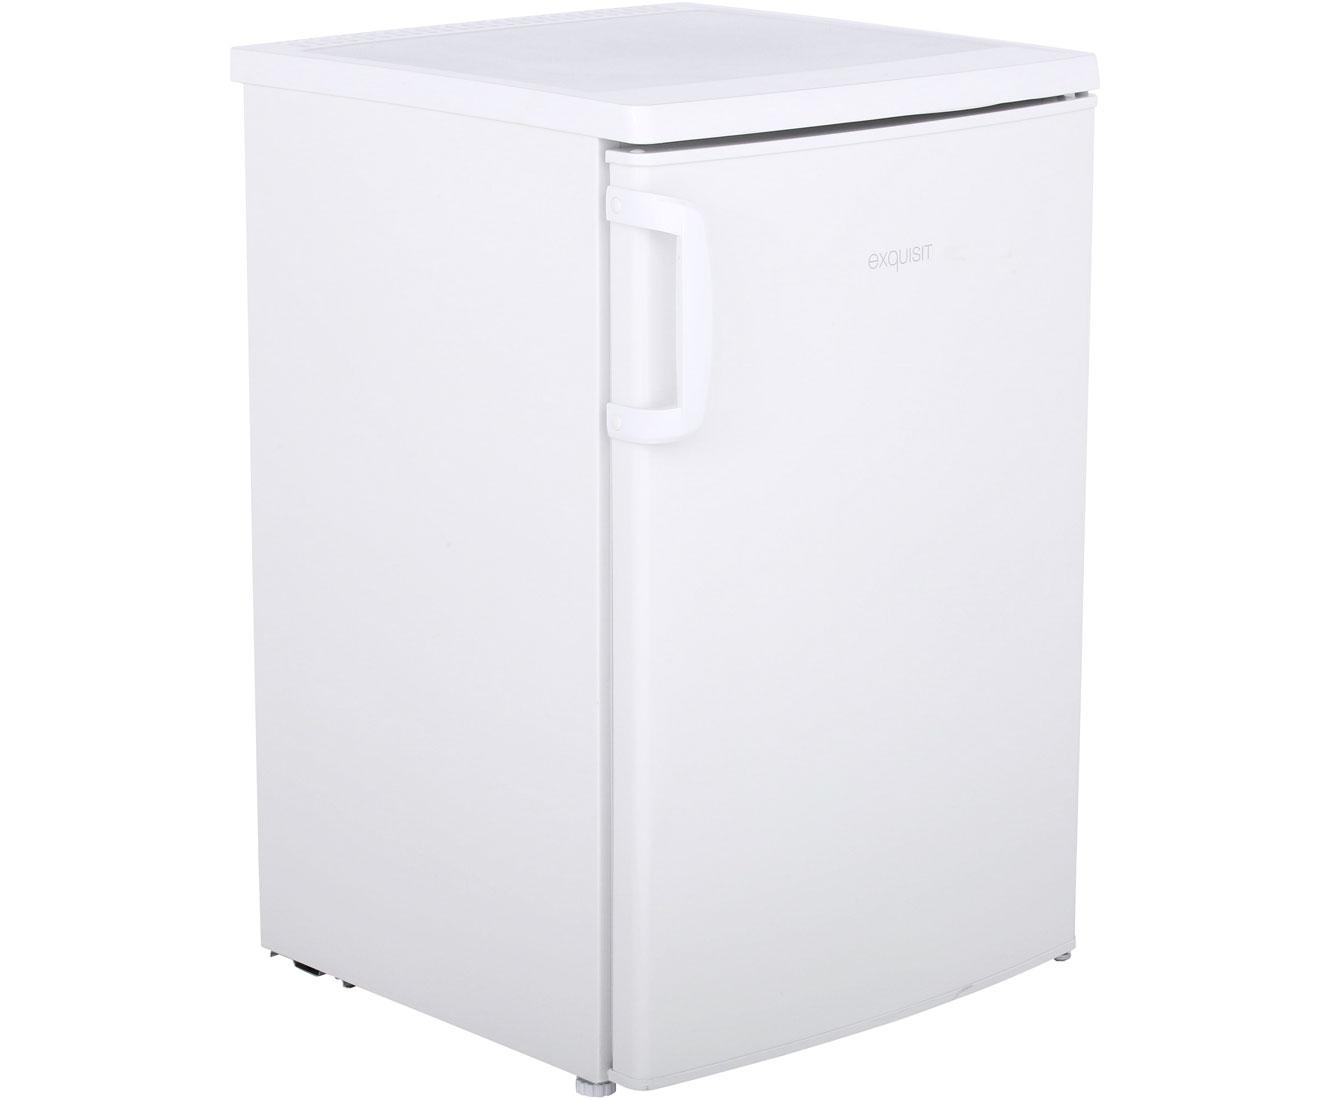 Kleiner Kühlschrank Real : Mini kühlschrank mit gefrierfach real frisch mini kühlschrank mit